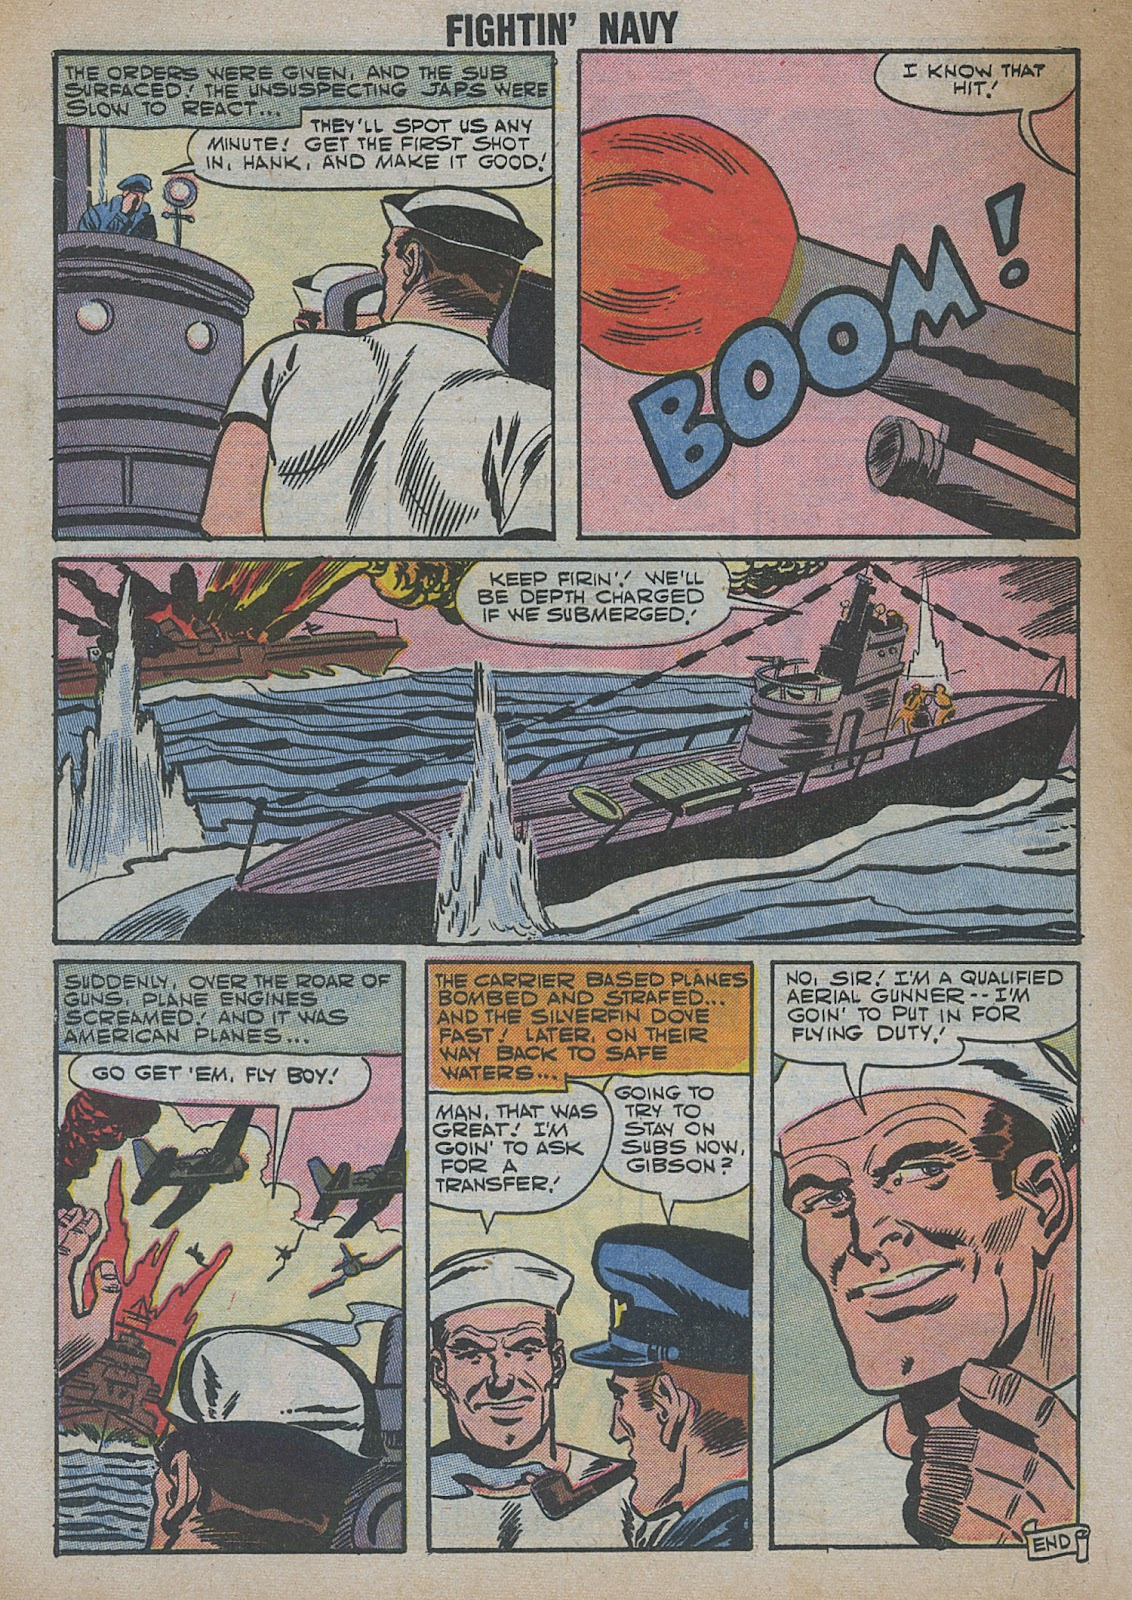 Read online Fightin' Navy comic -  Issue #82 - 58